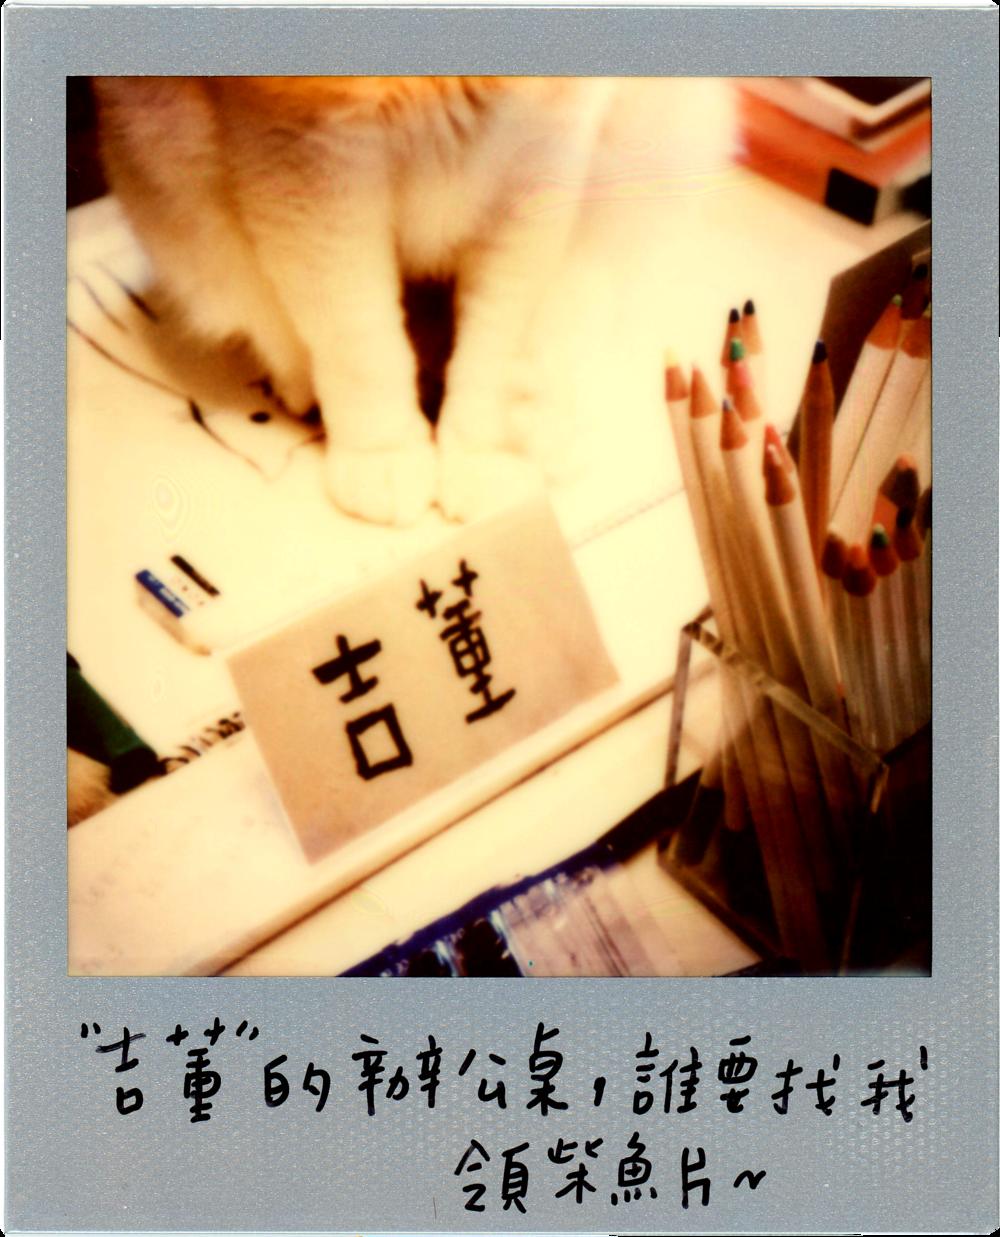 0707-2014-白吉-字2.png